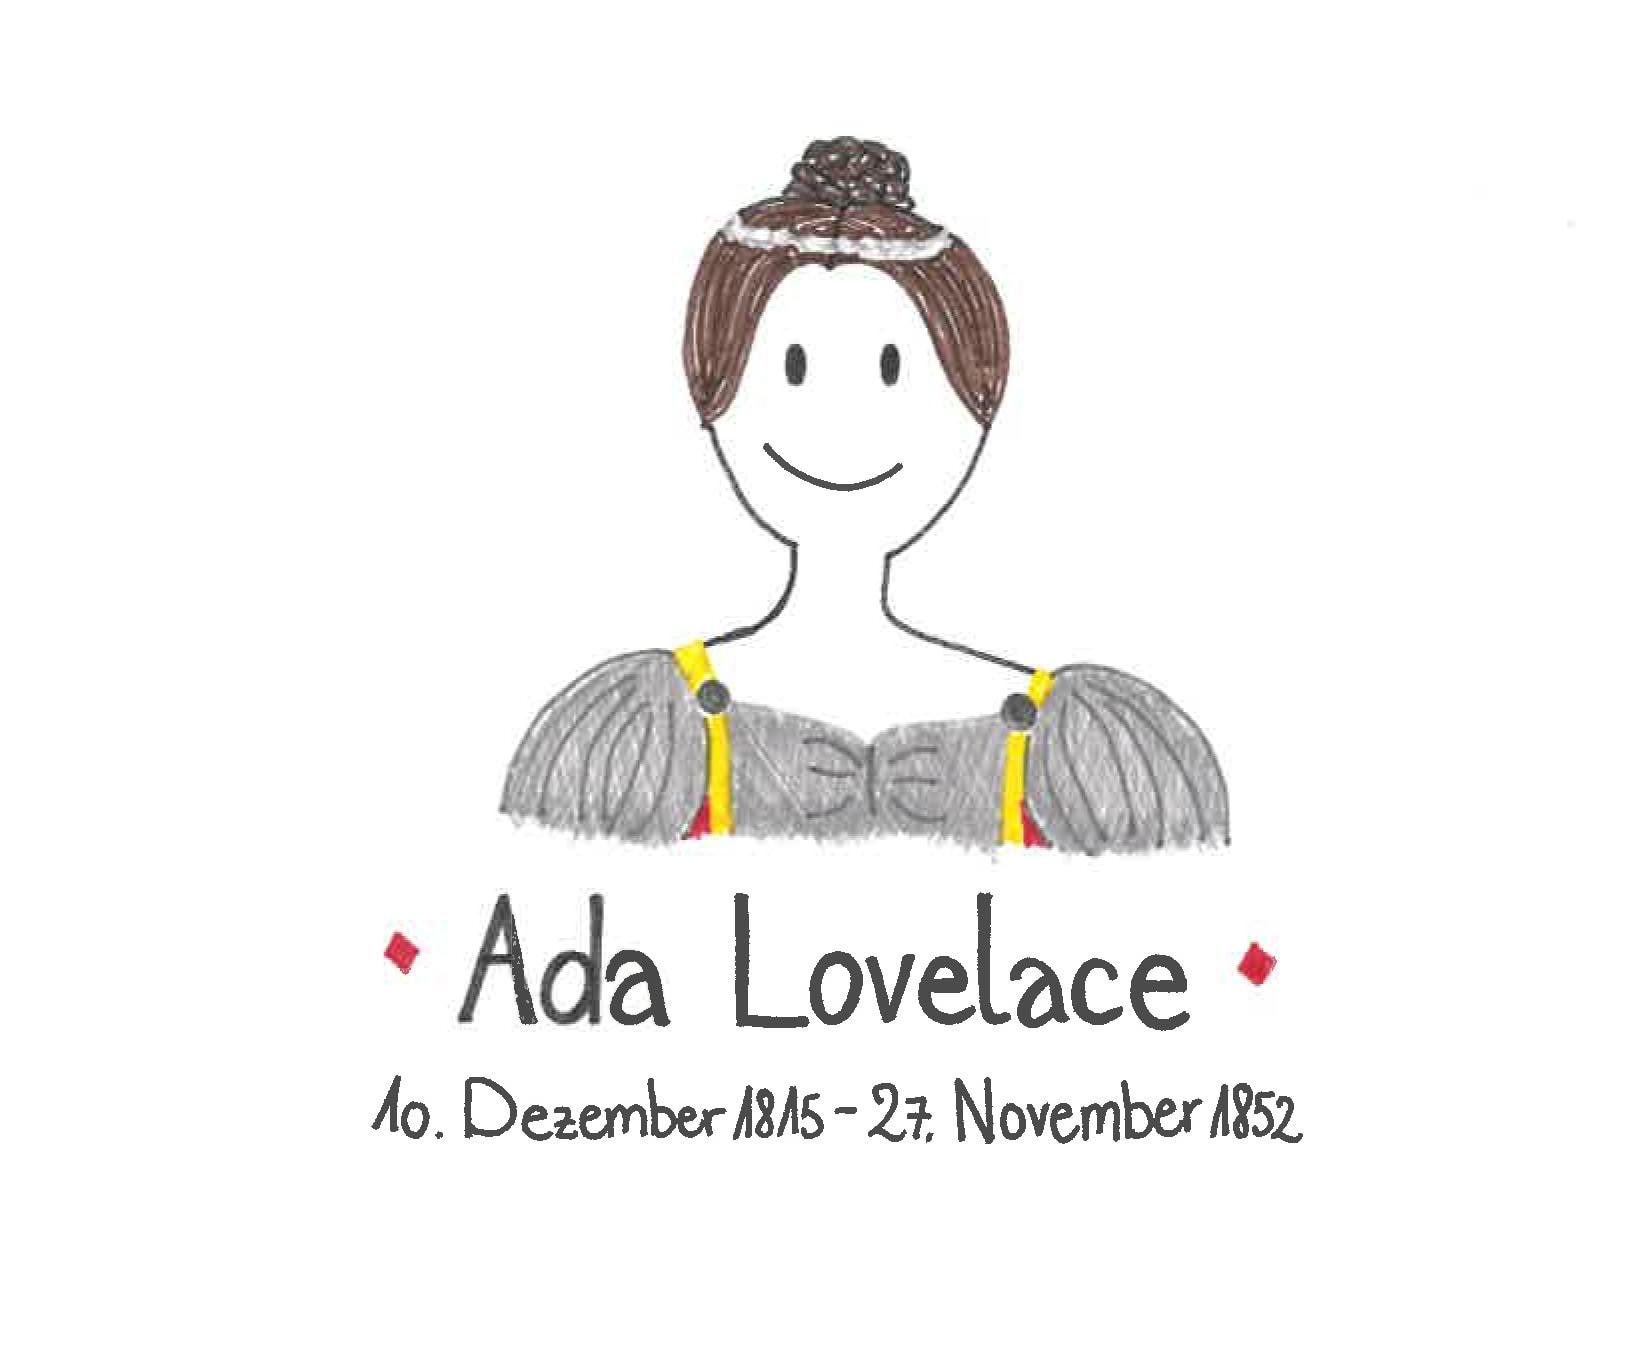 Illustration von Ada Lovelace